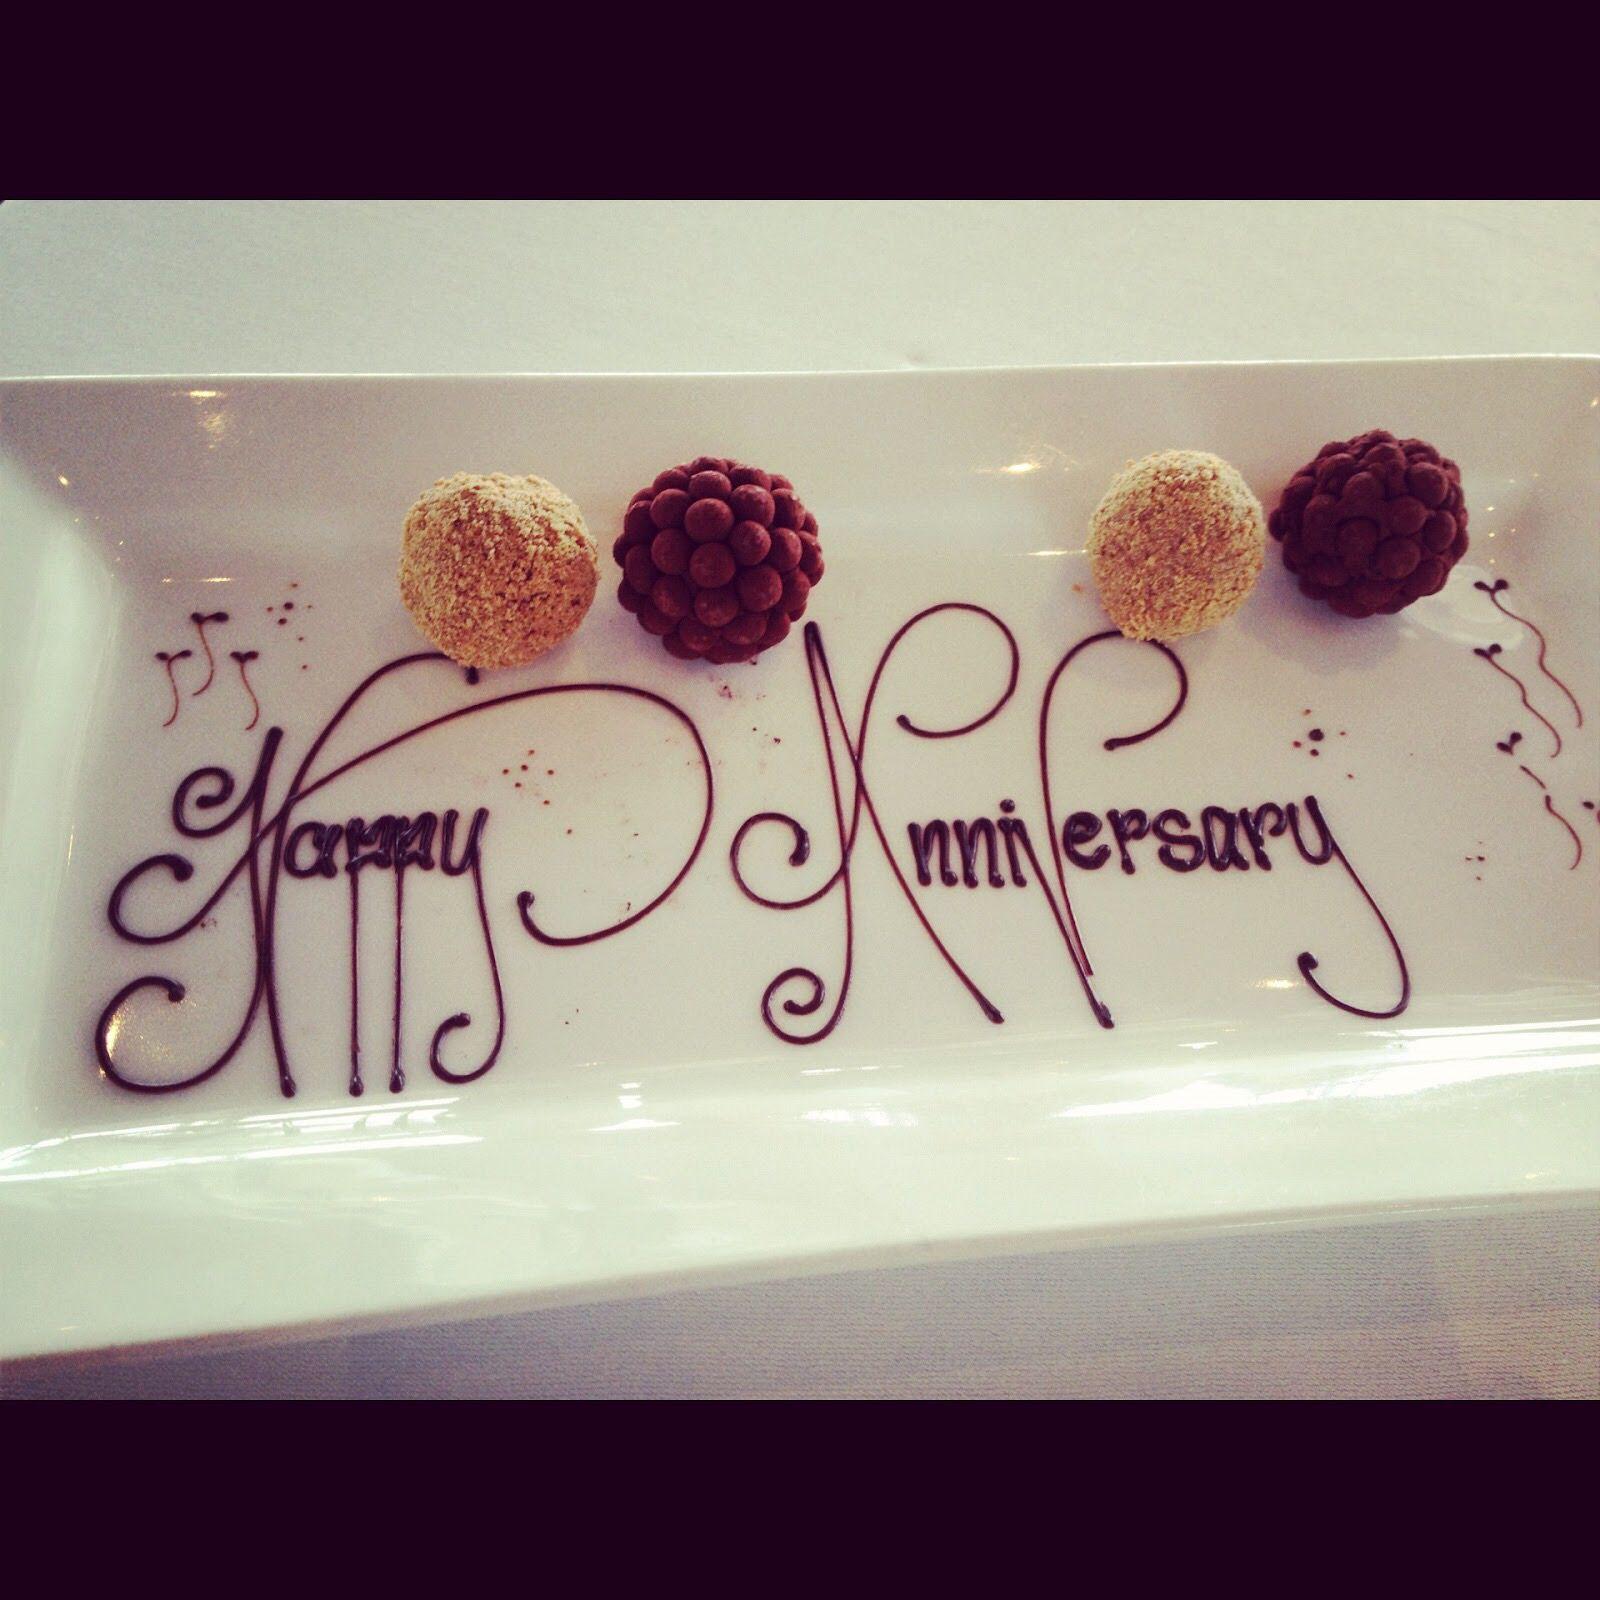 Happy Anniversary Anniversary Dessert Happy Anniversary Wedding Anniversary Quotes